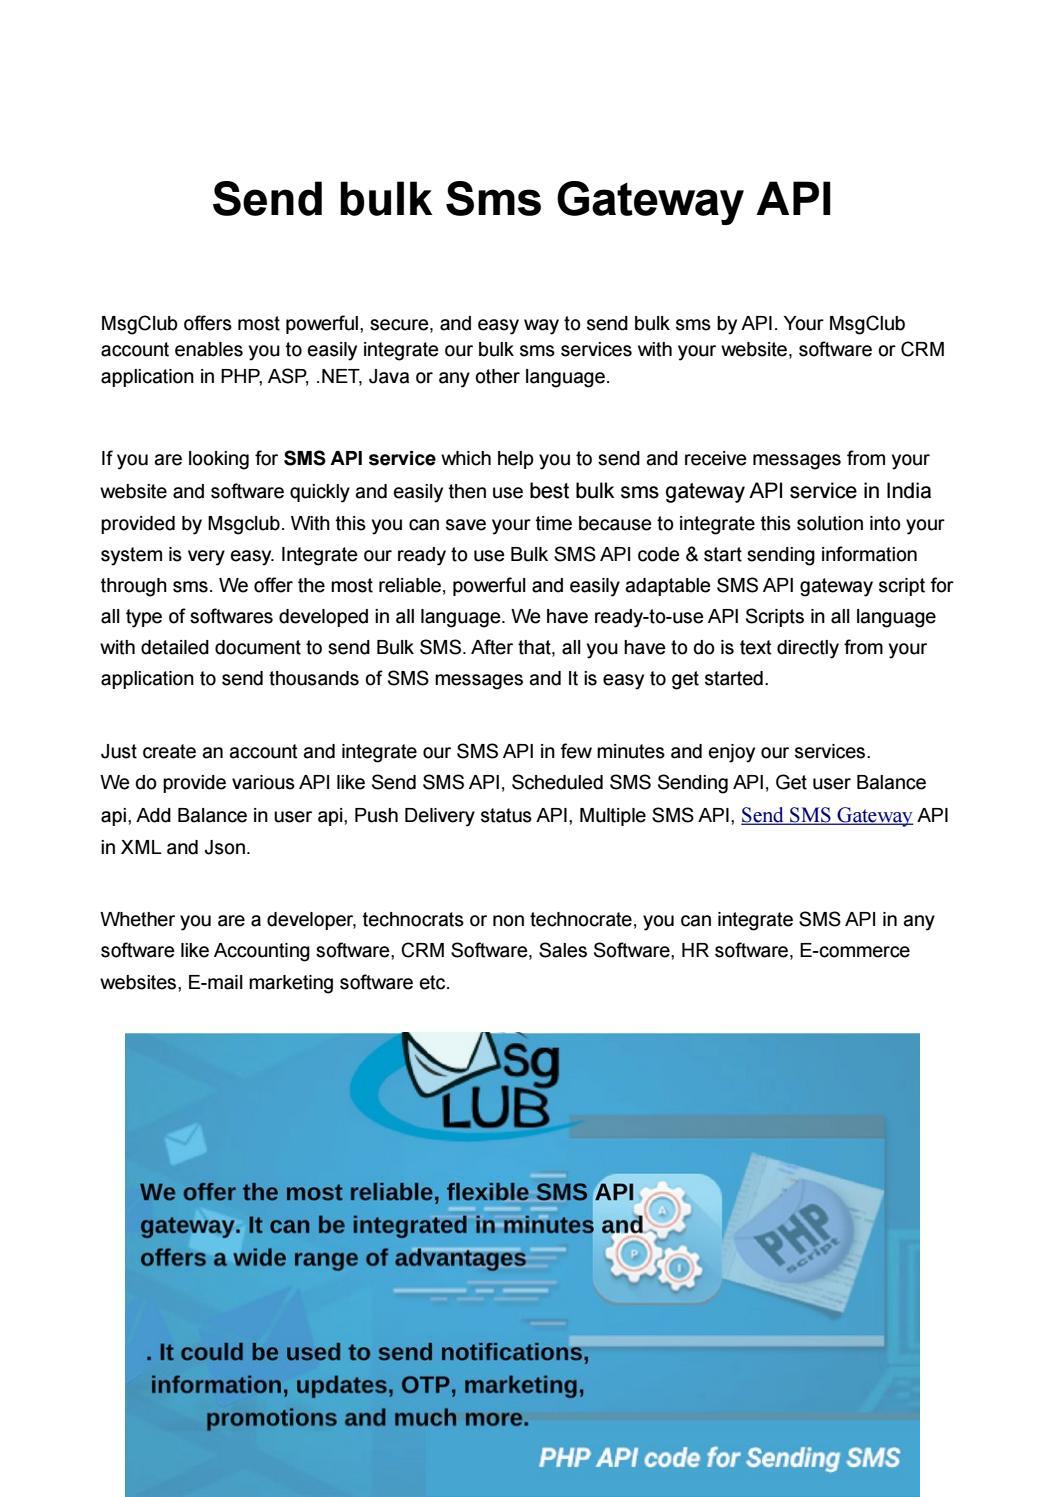 Send bulk Sms Gateway API by roopesh - issuu